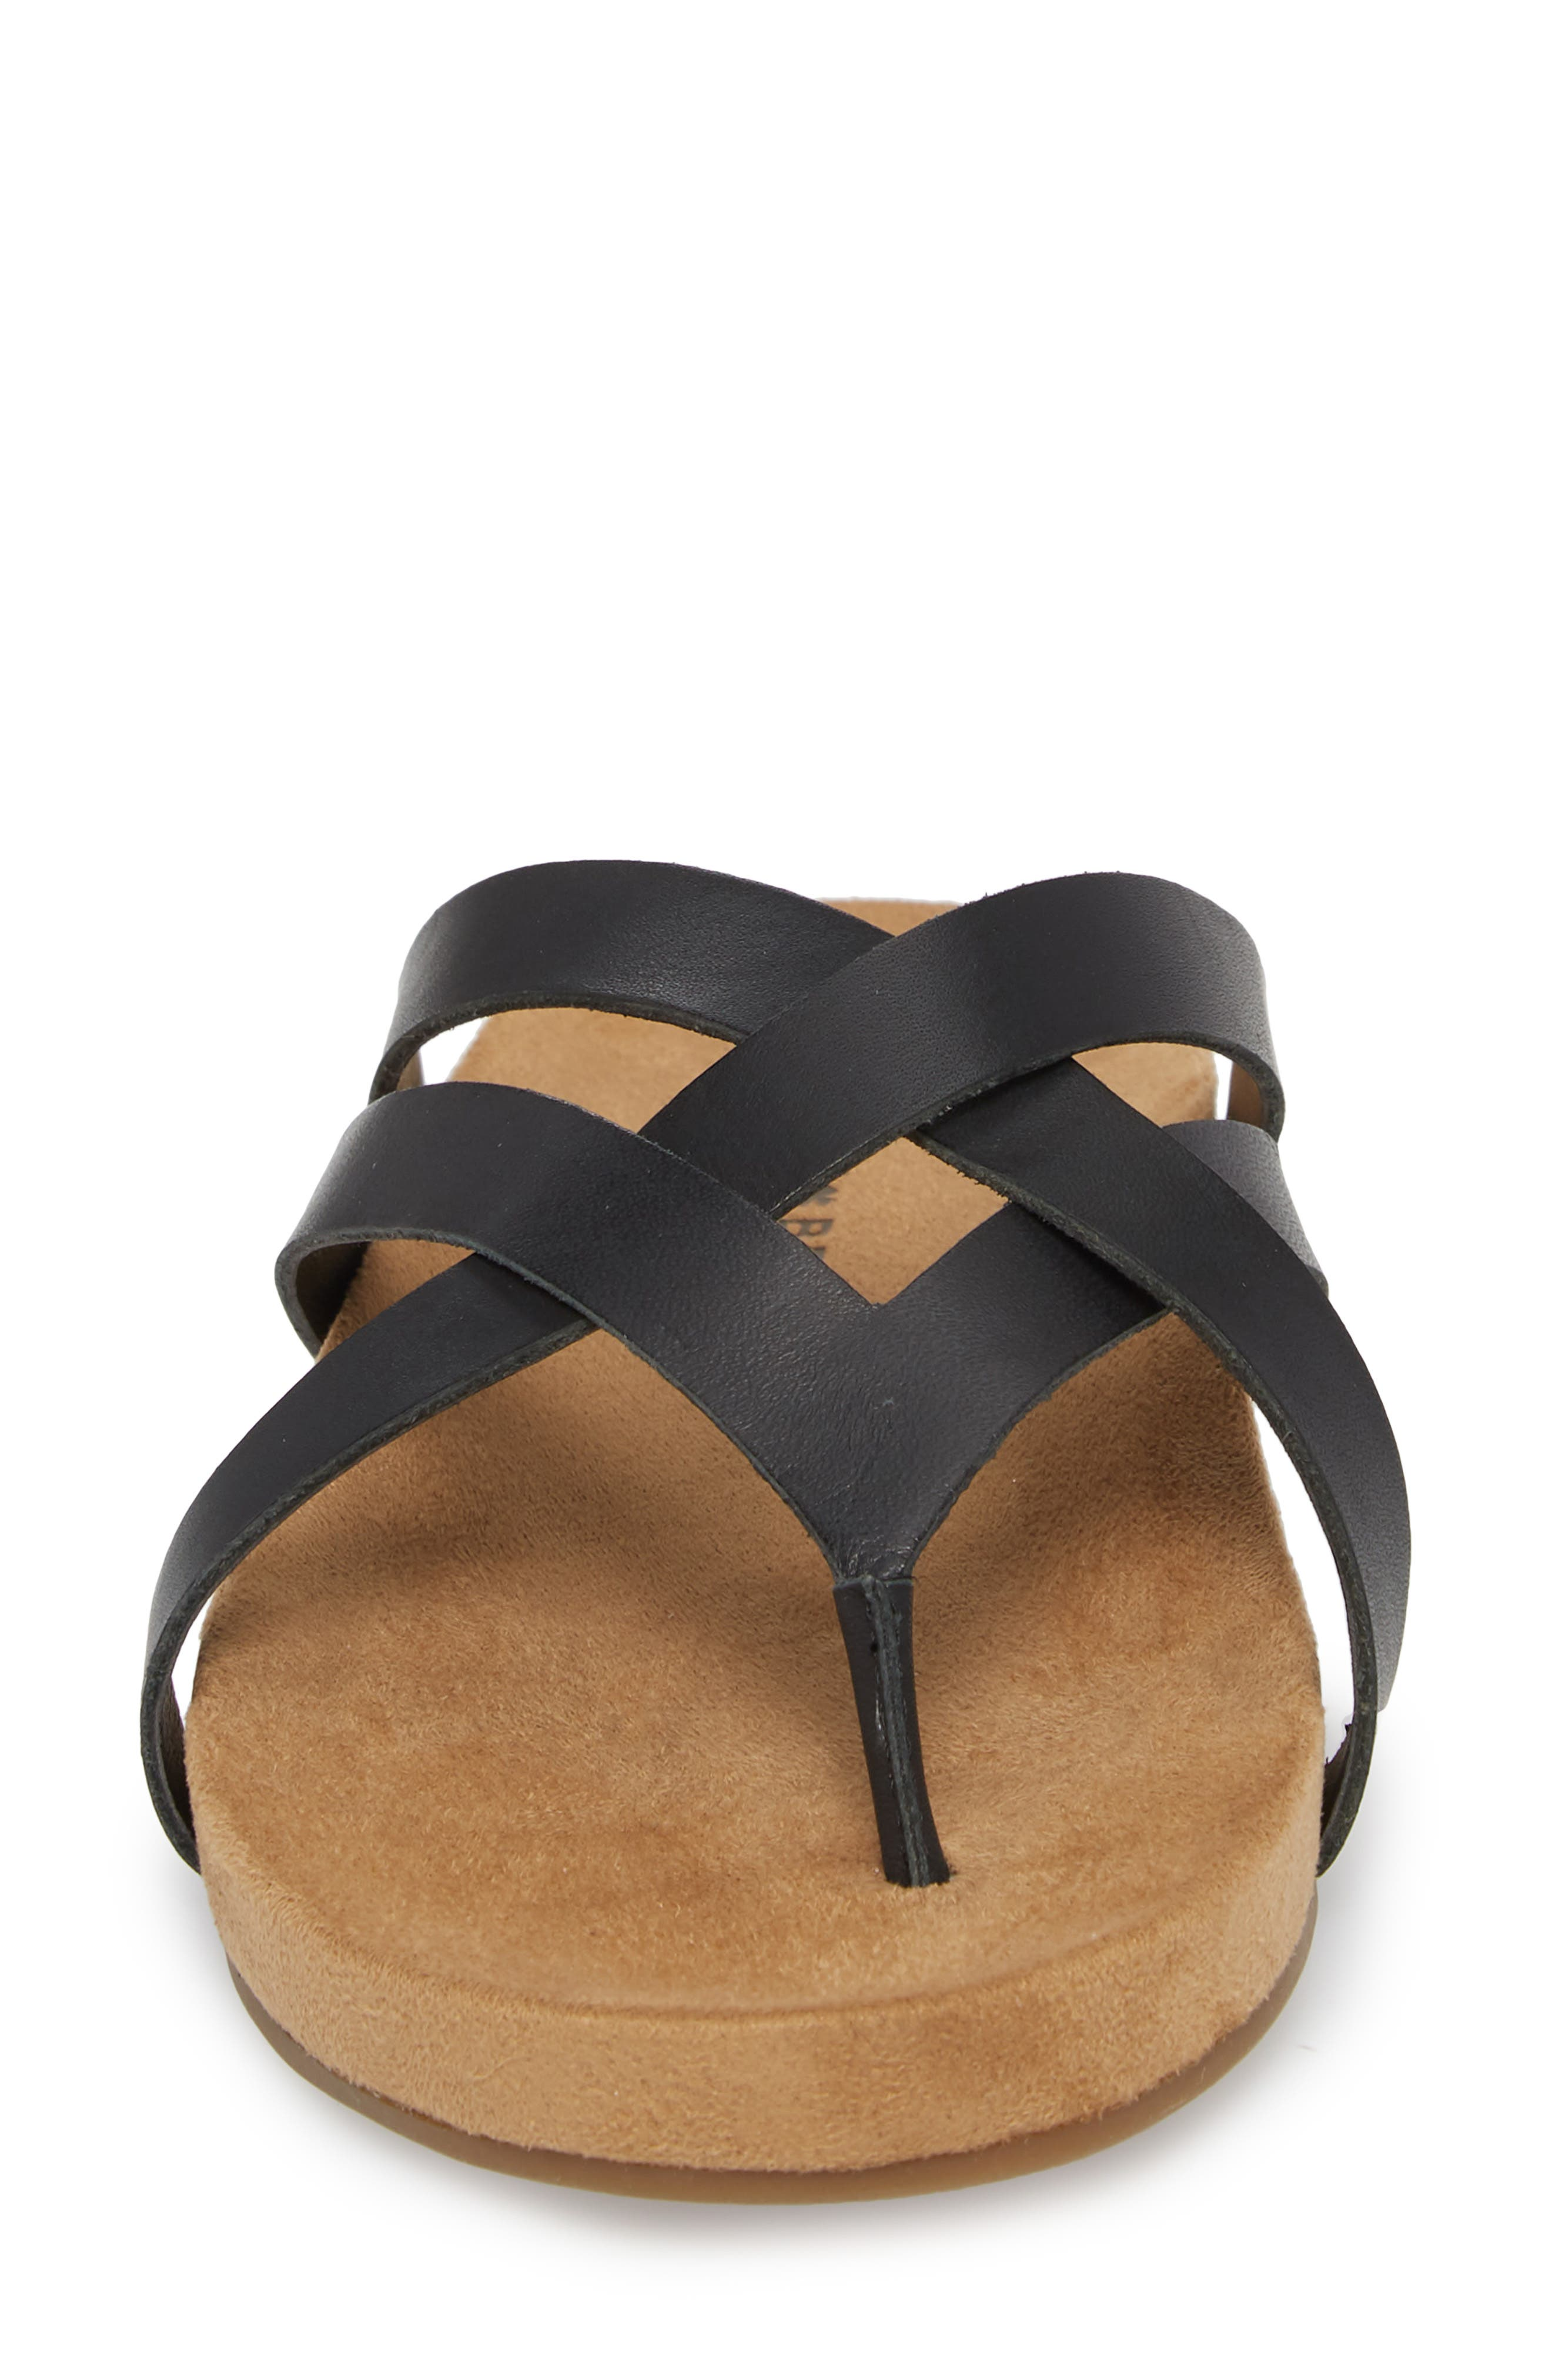 Fillima Flip Flop,                             Alternate thumbnail 4, color,                             Black Leather